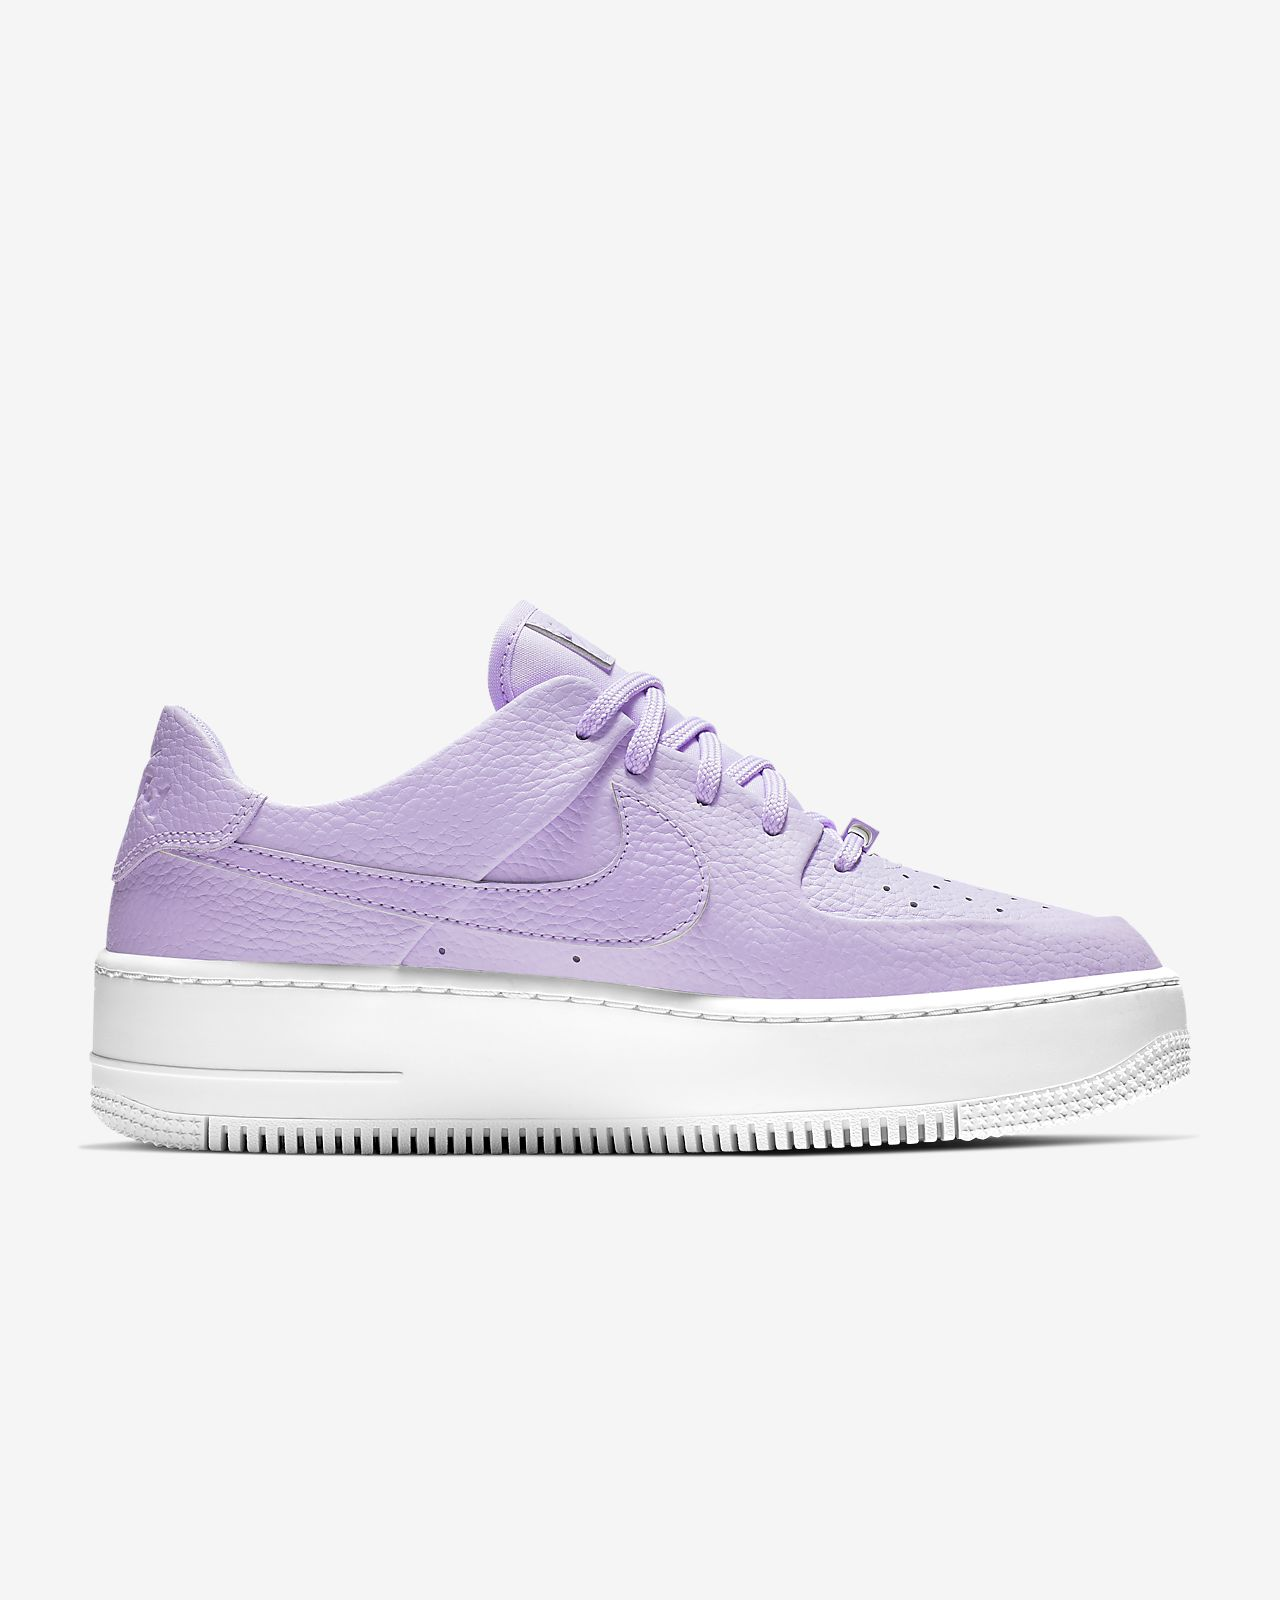 1c9ebadd Nike Air Force 1 Sage Low Zapatillas - Mujer. Nike.com ES